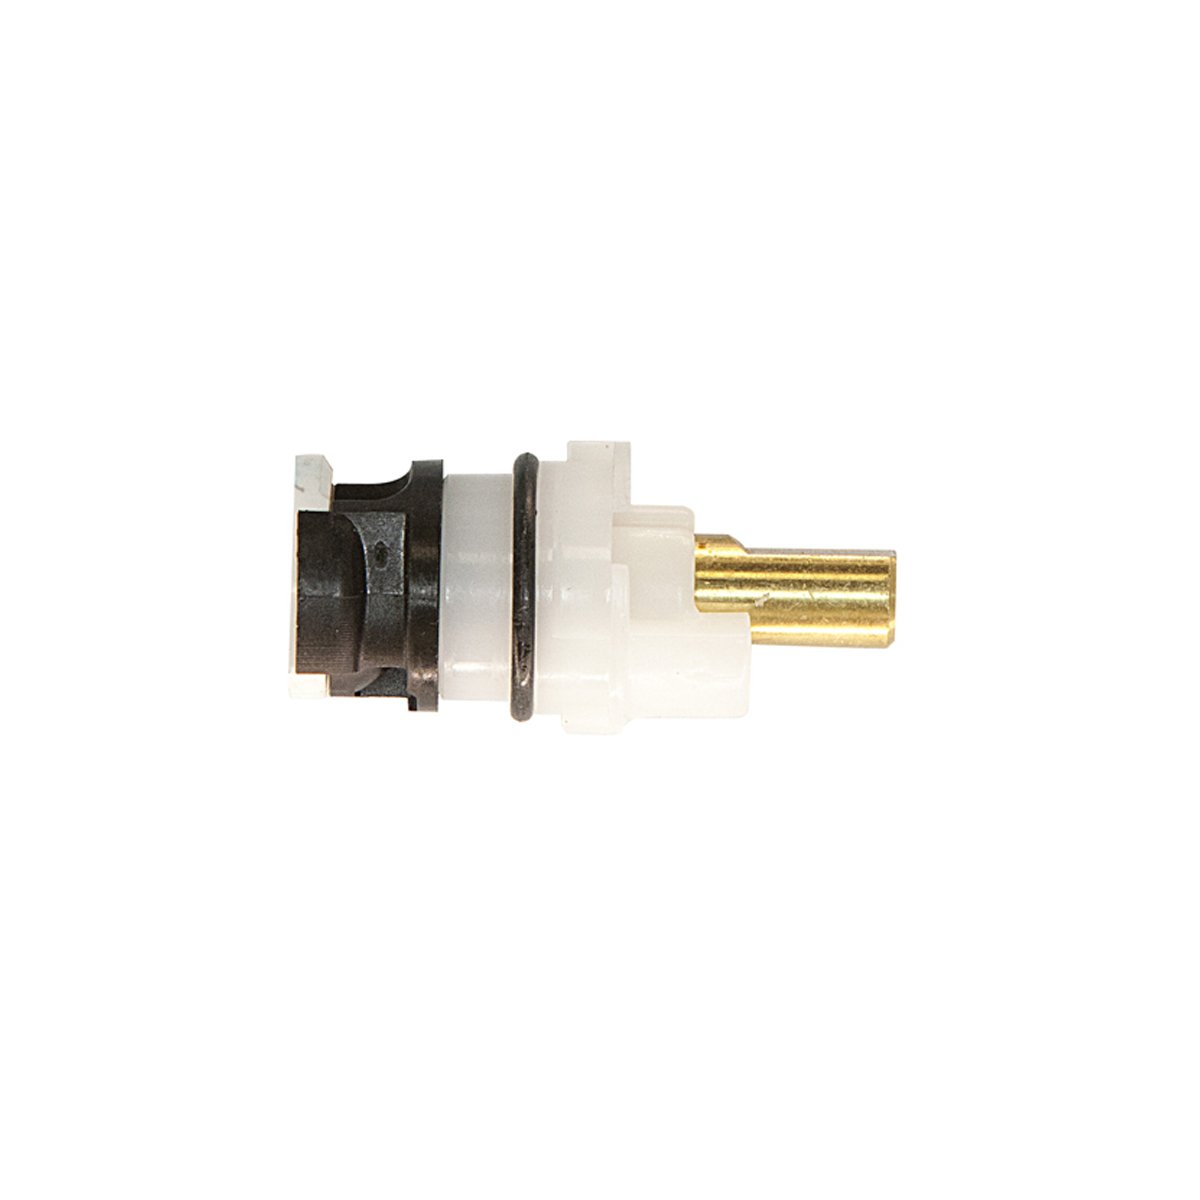 Danco 17464B 3S-3H/C Hot/Cold Stem for Delta/Delex Faucets